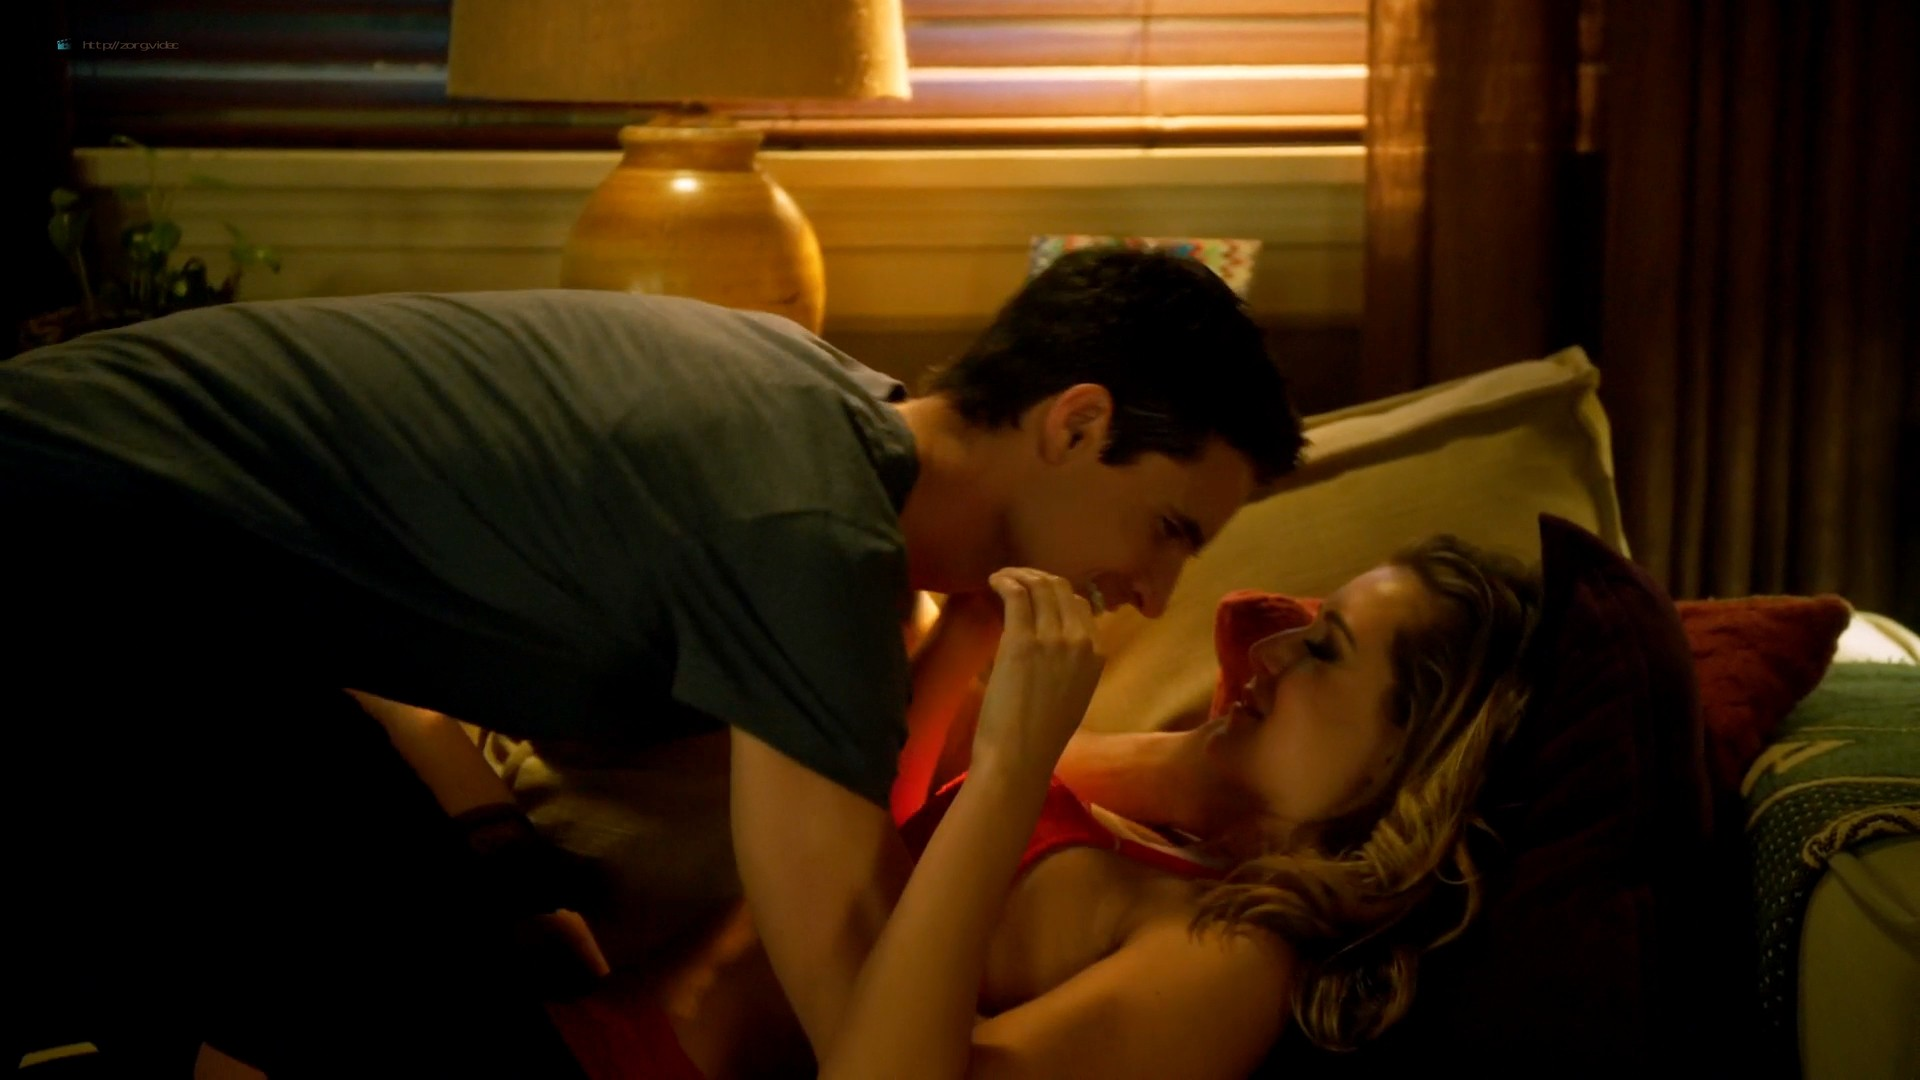 Alexa Vega hot and some sex - The Tomorrow People (2014) s1e18-19 HD (3)